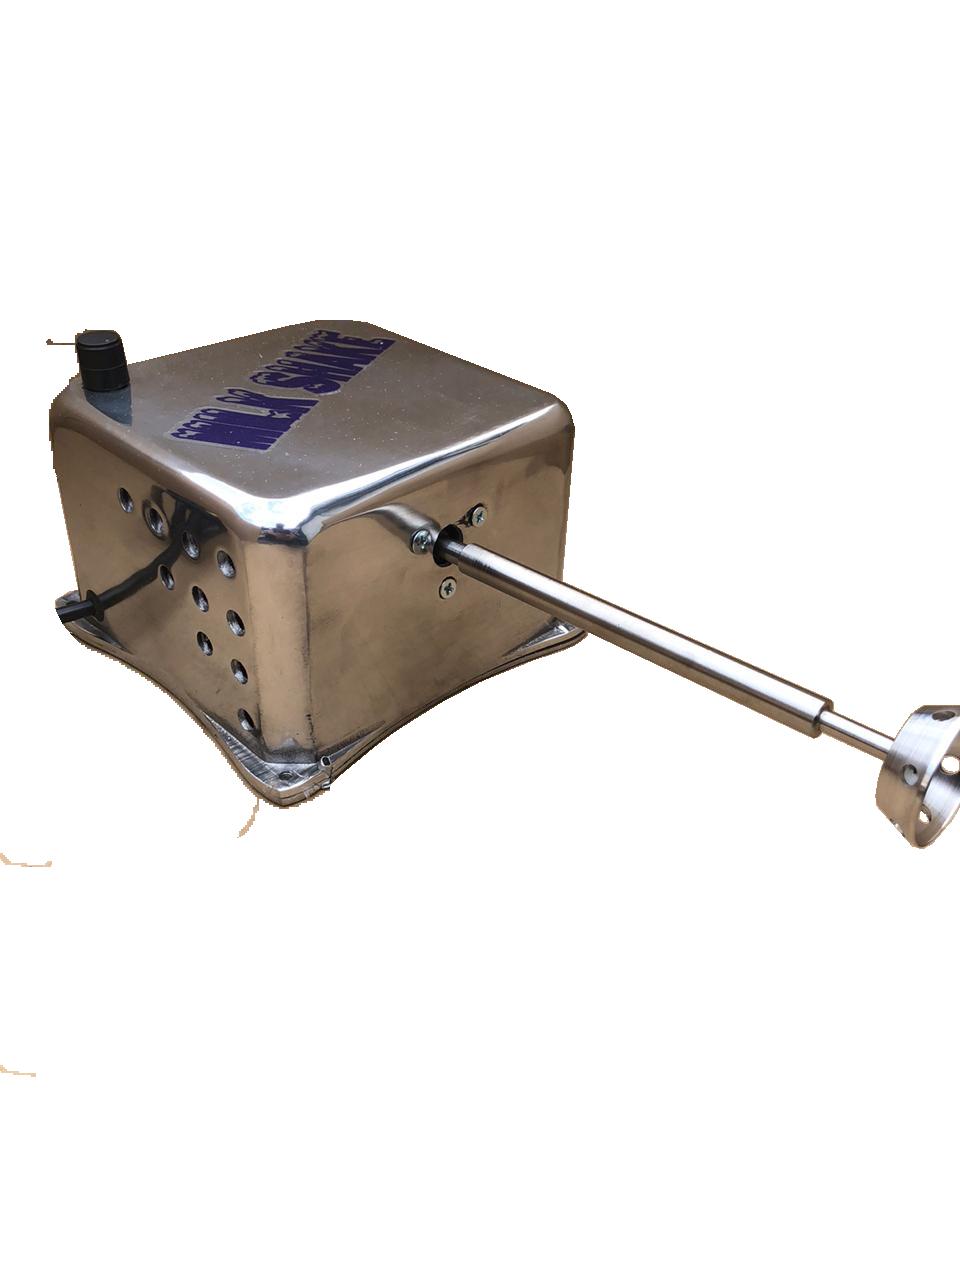 Maquina Milk Shake Industrial Cm 2014 750 Watts 18000 Rpm PRATA   - Controlpot Maquinas e Batedores Milk Shake e Furador de Côco